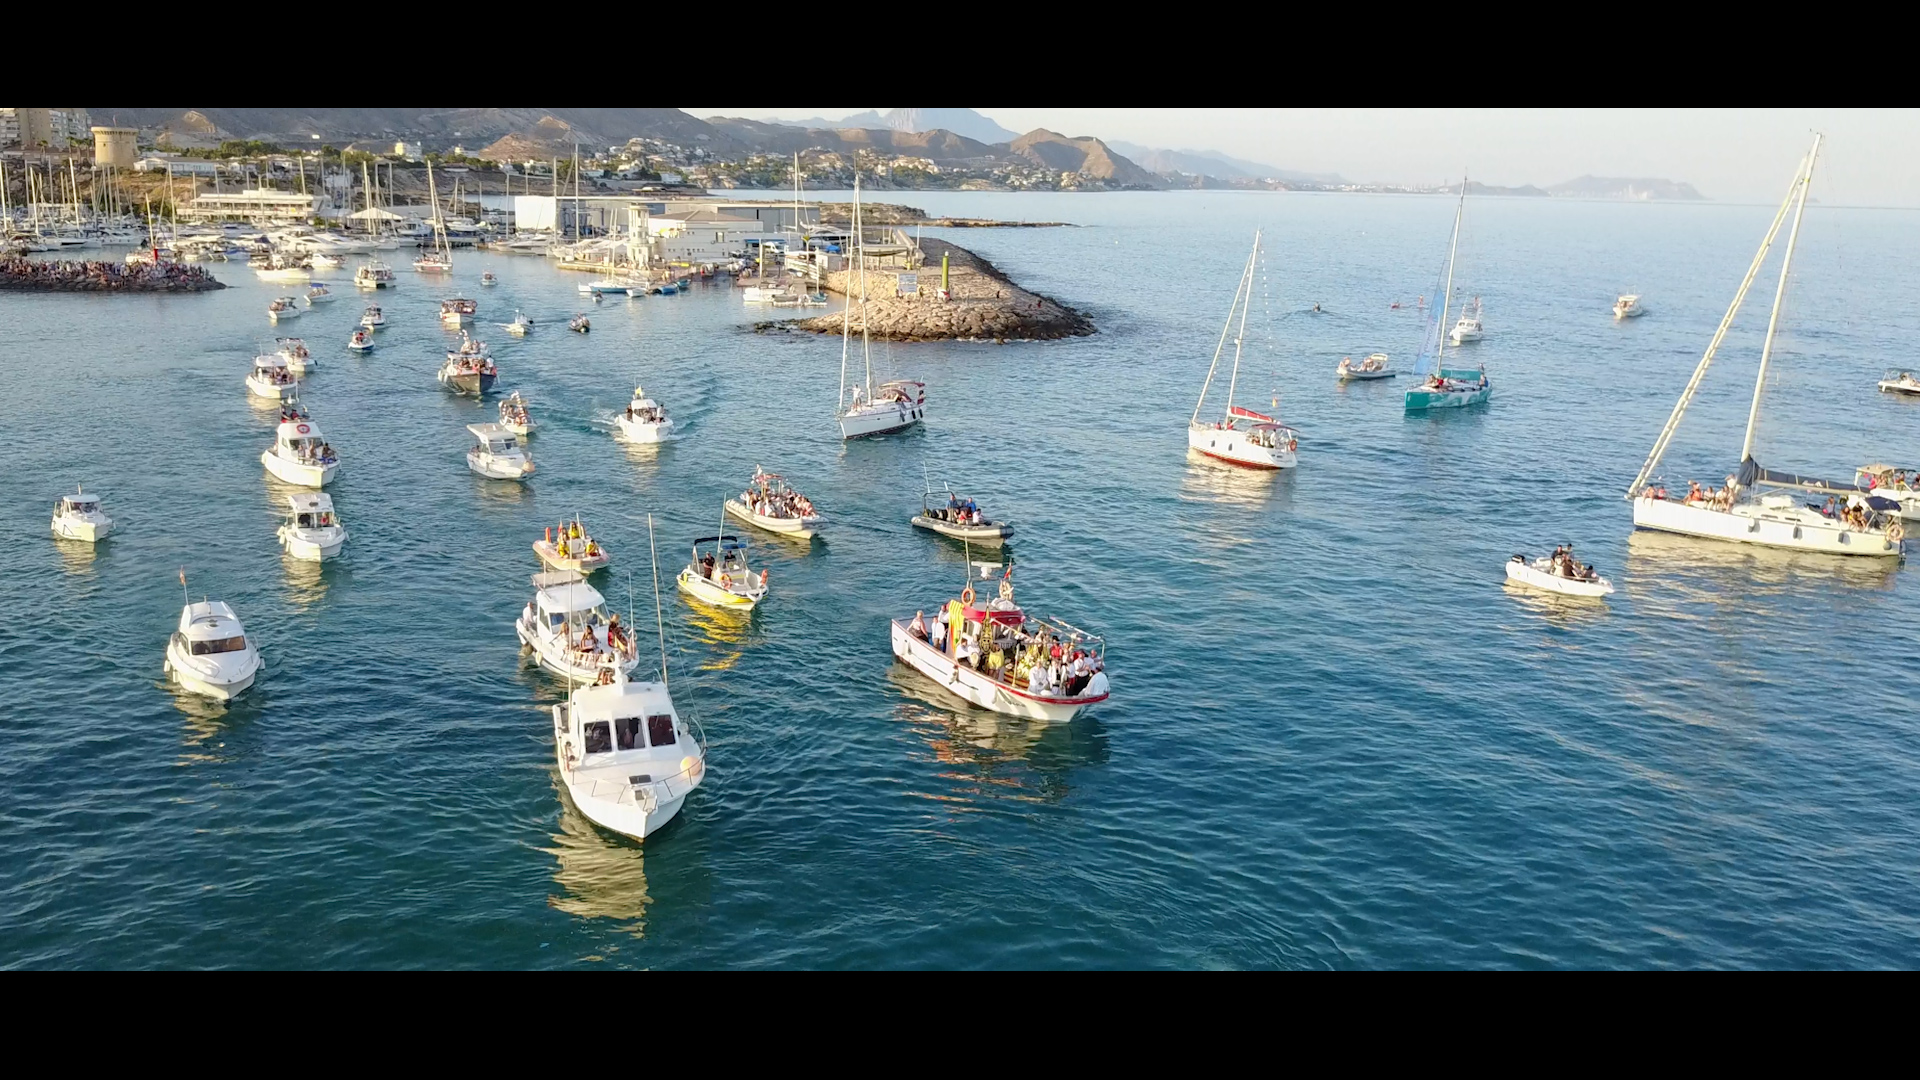 Vídeo Promocional FITUR El Campello 2018